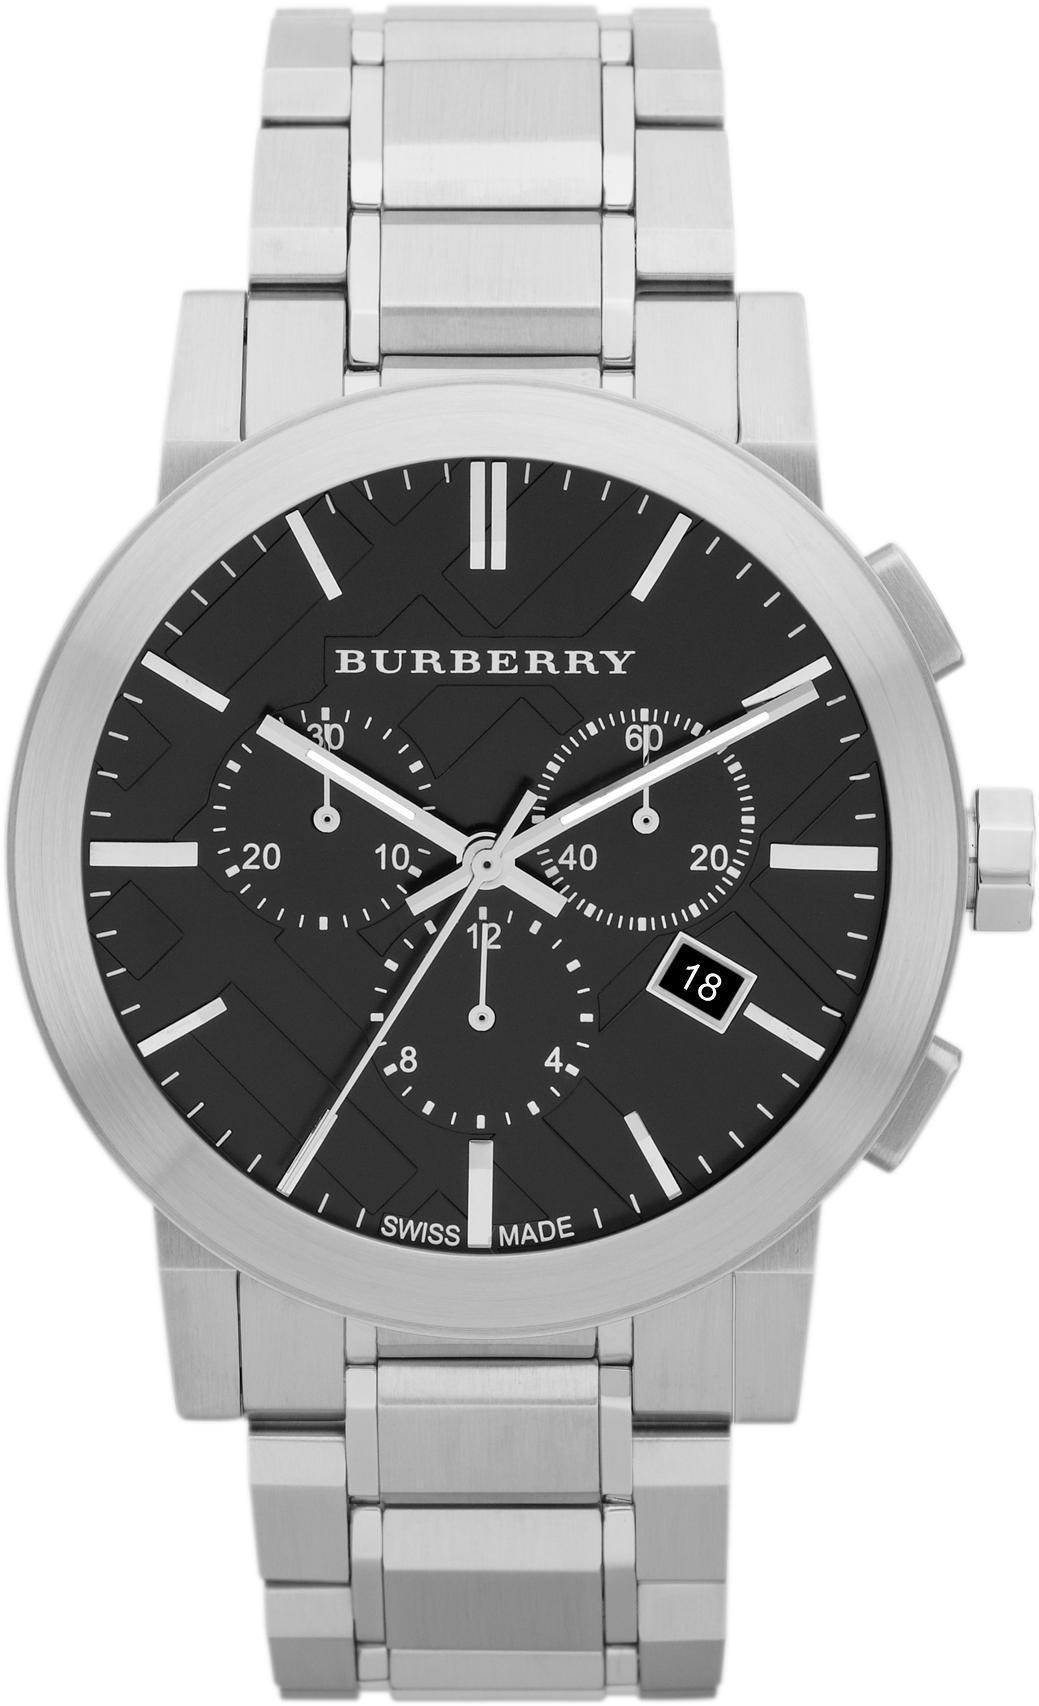 burberry die stadt chronograph herren armbanduhr bu9351 ebay. Black Bedroom Furniture Sets. Home Design Ideas